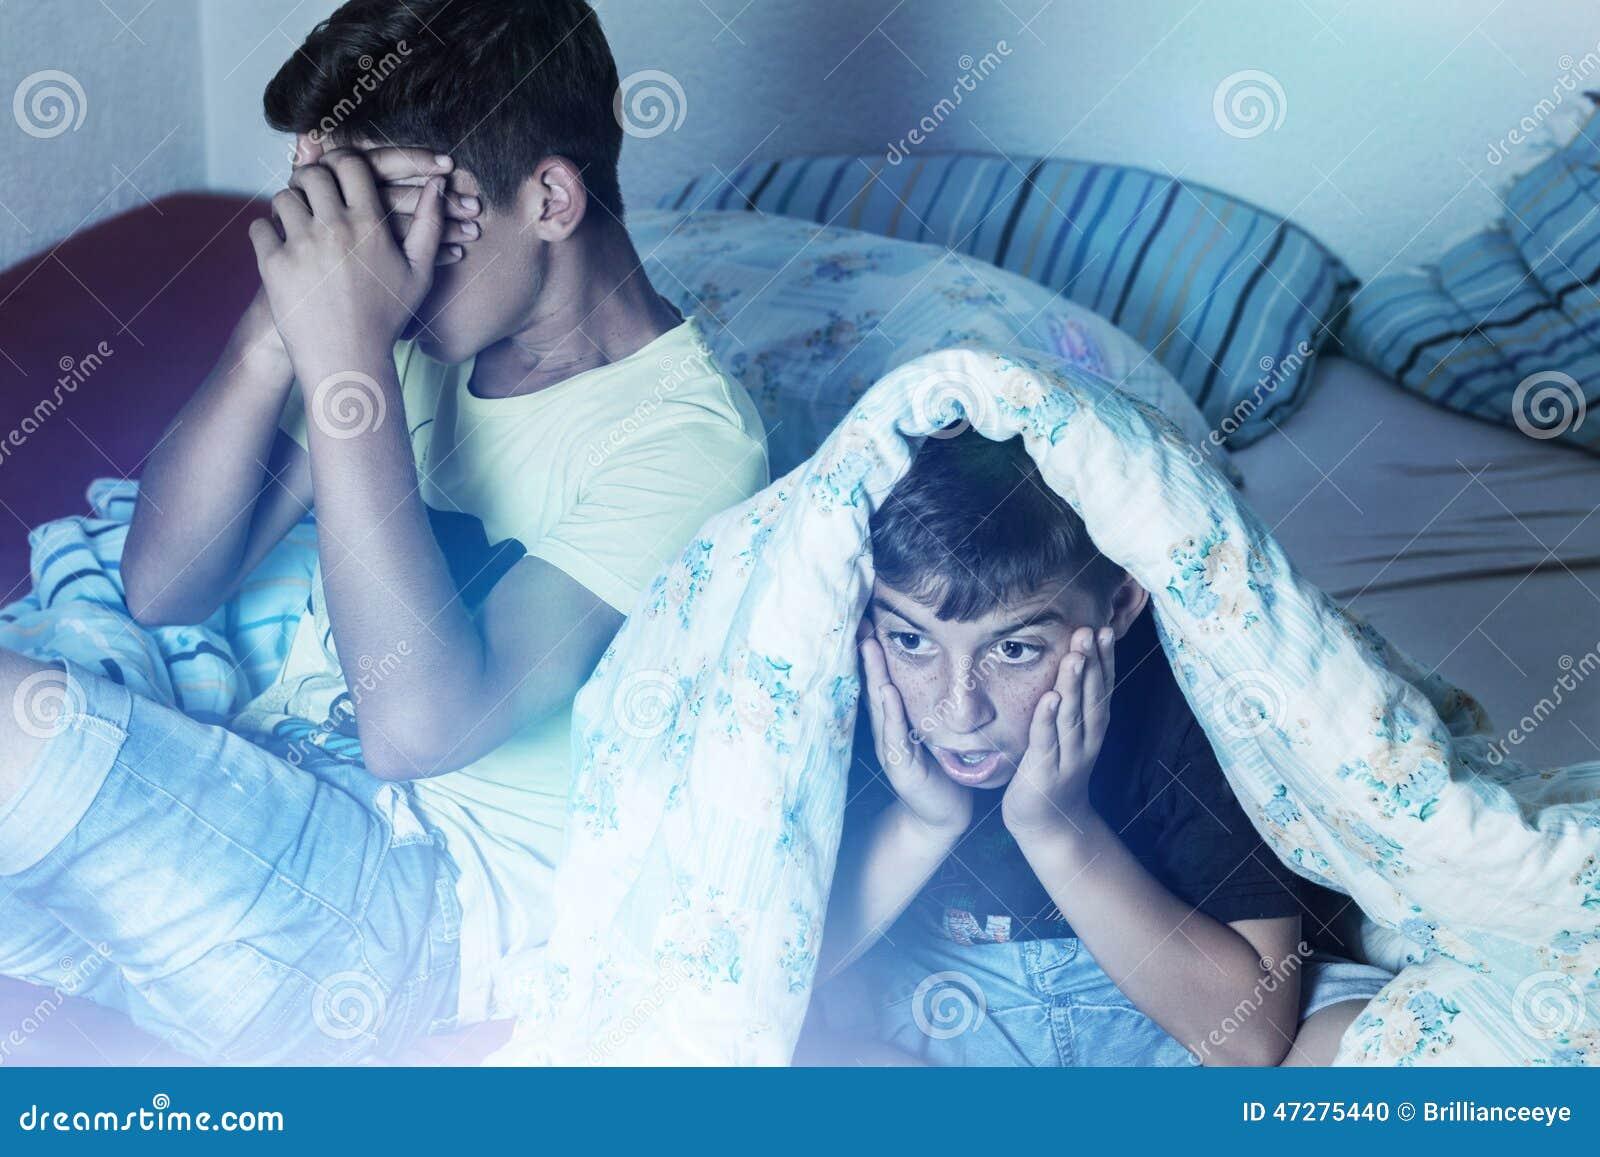 Horrified kids watching tv